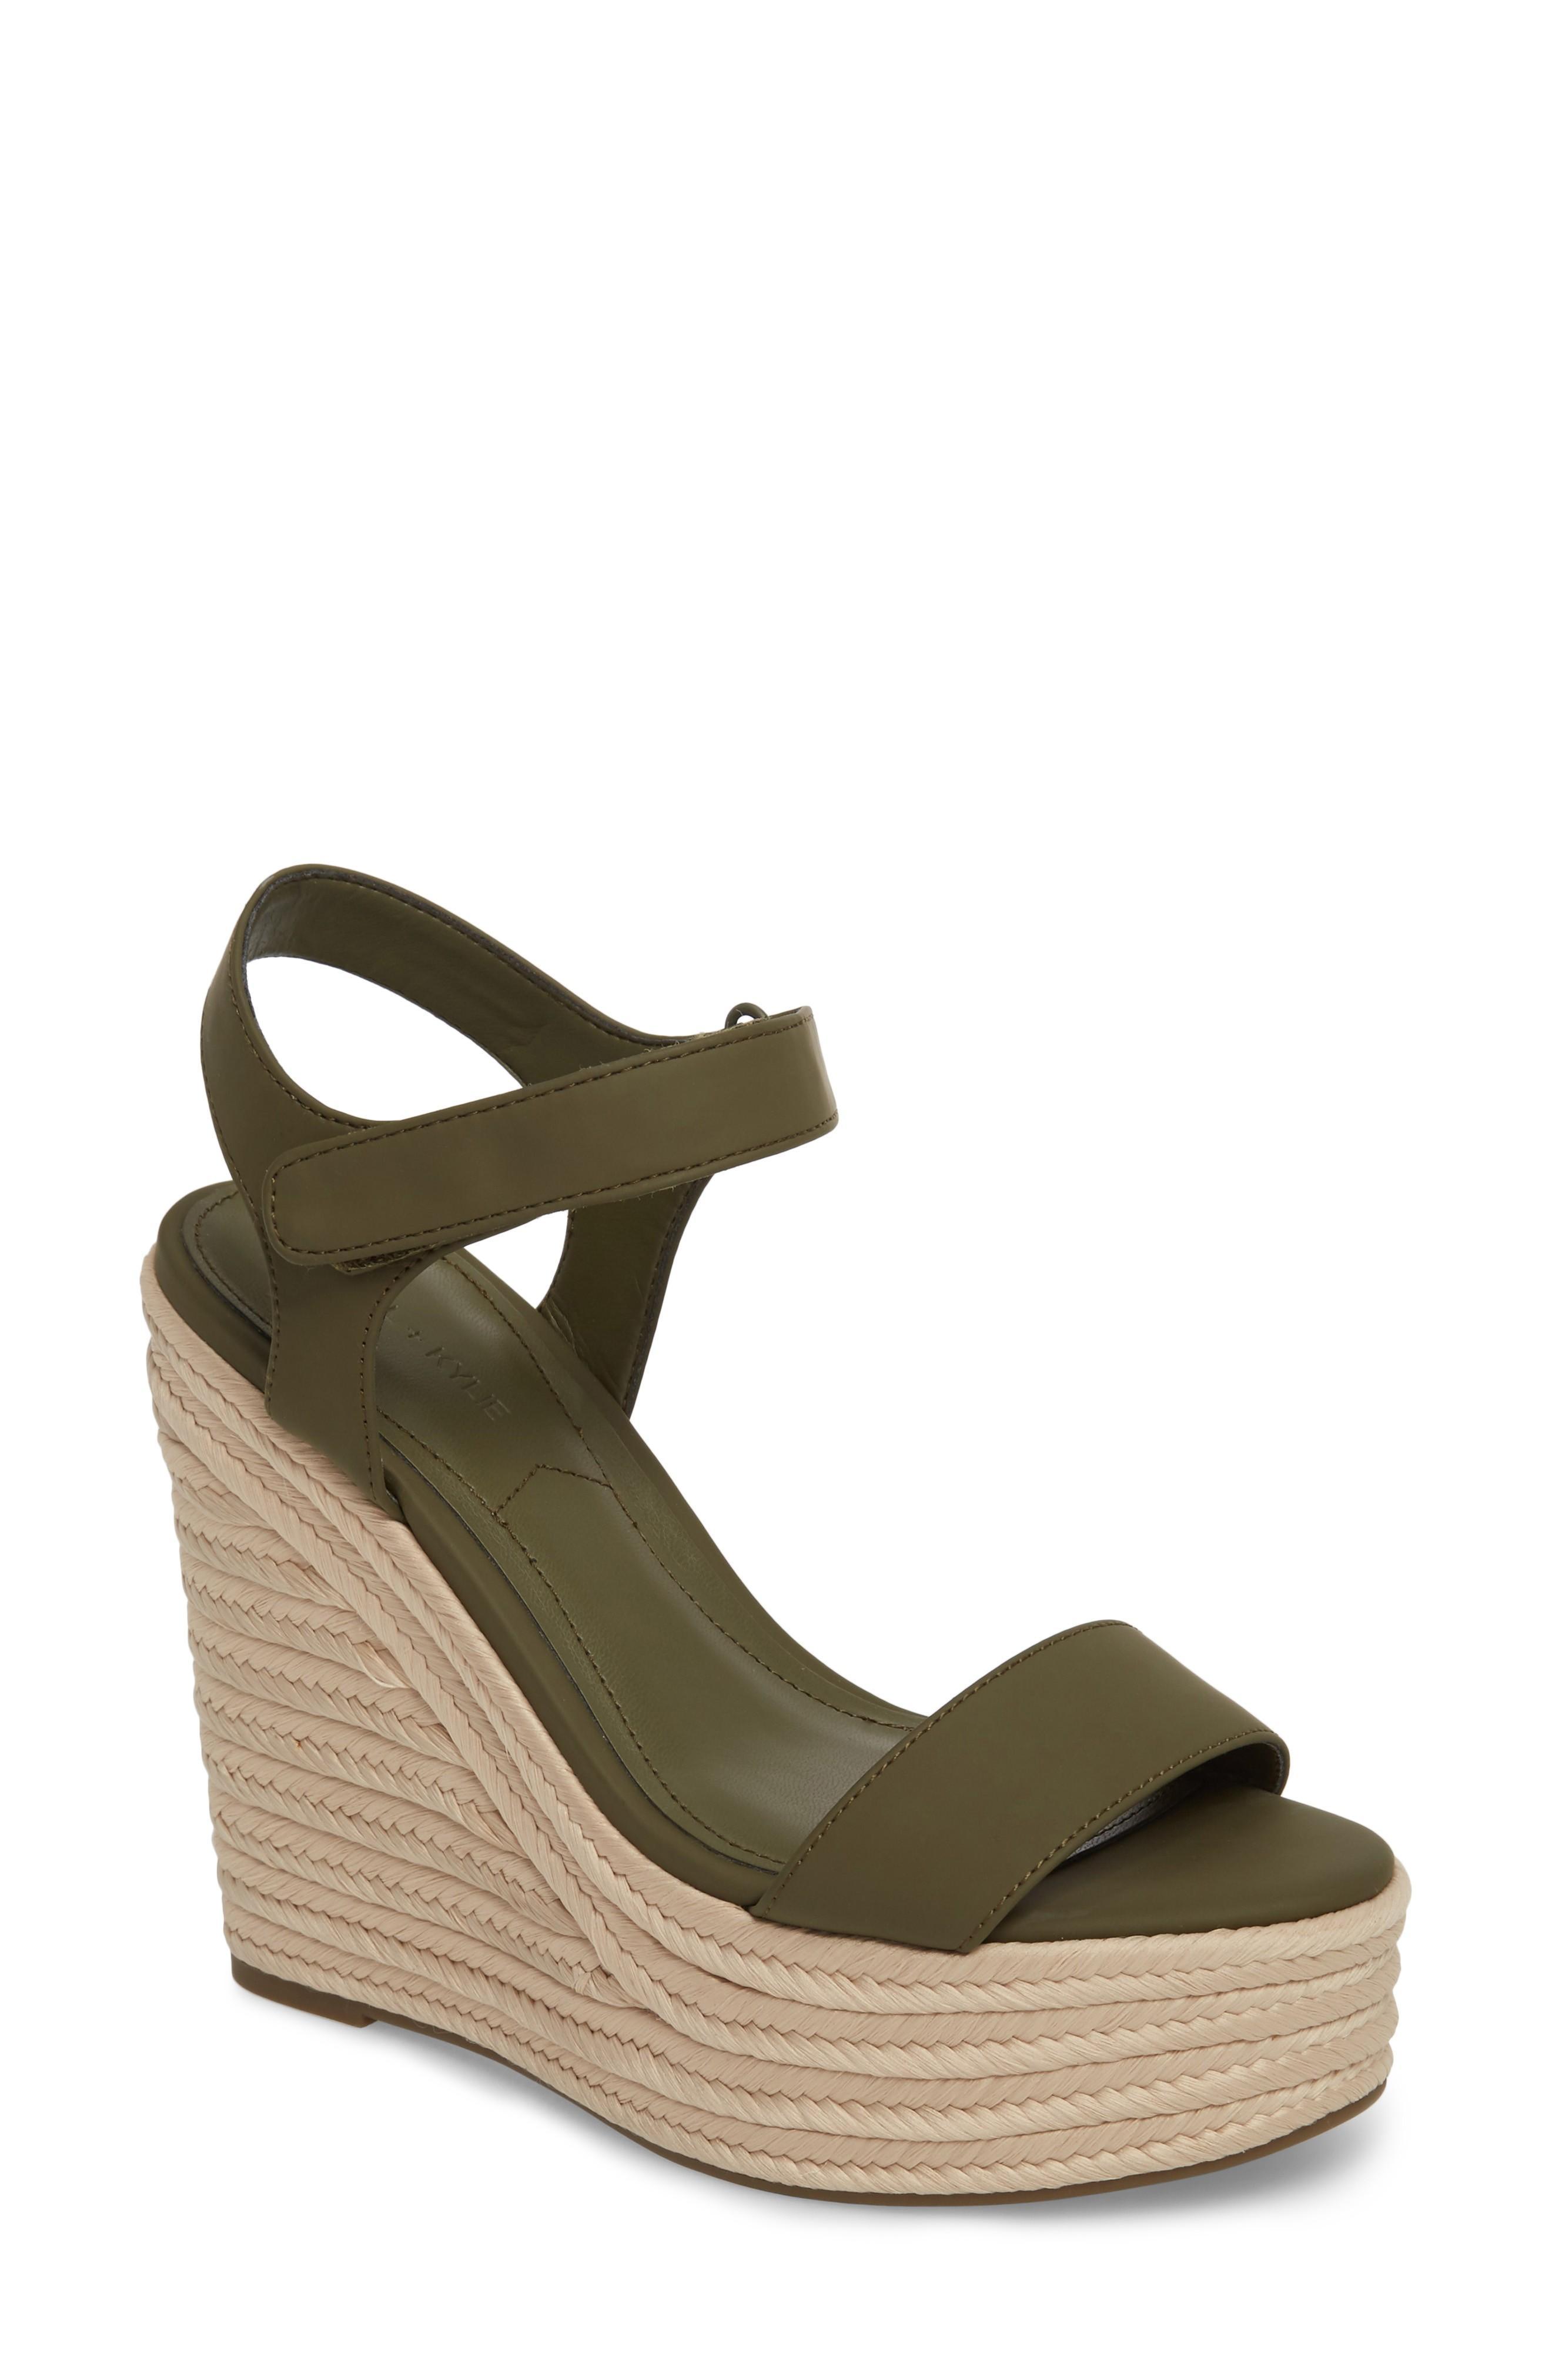 5c1e53b34b29 Kendall + Kylie Grand Sport Espadrille Wedge Sandal In Army Green ...